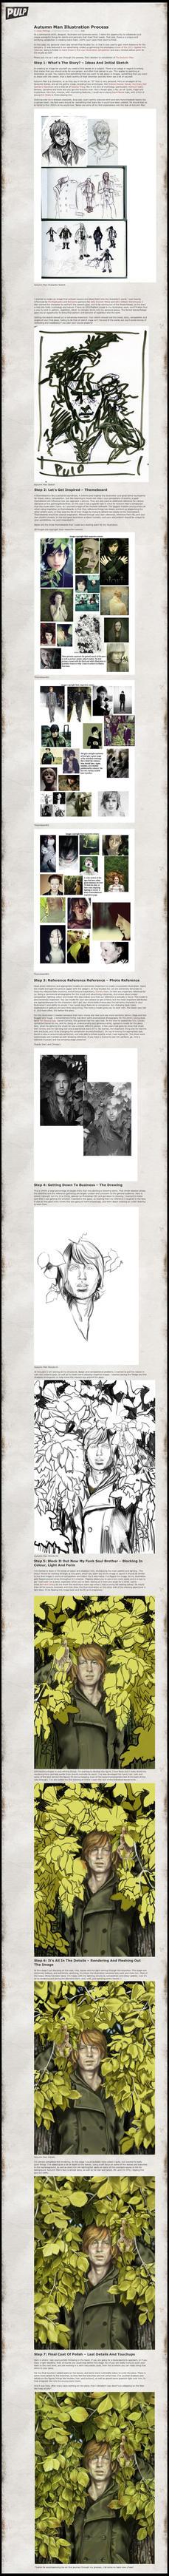 Autumn Man Digital Illustration Process by kellistrator